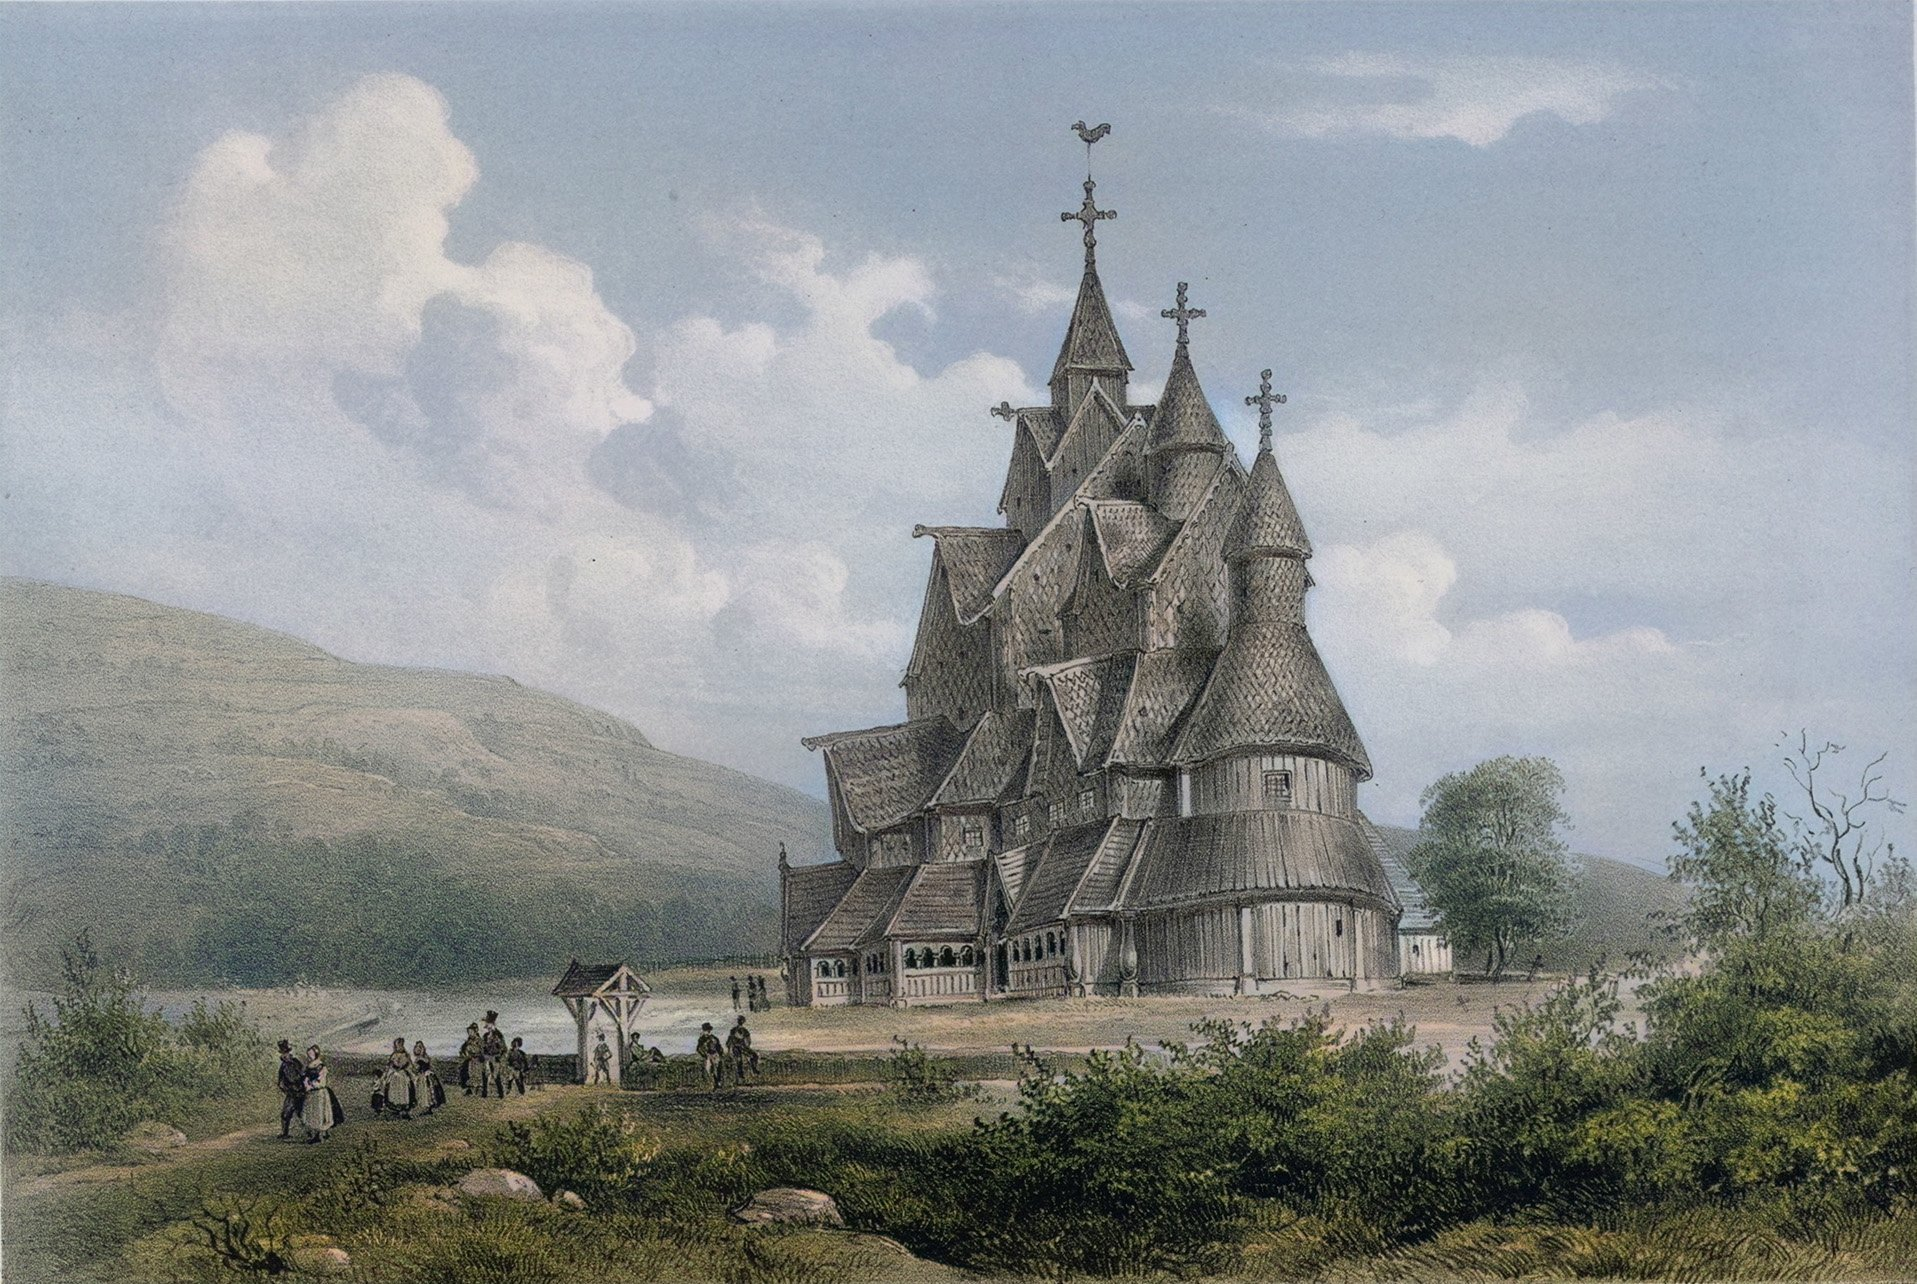 The Heddal stave church. Book illustration from 1848.   Drawing: Hjalmar Kjerulf - wikimedia DeOldify cc pdm.